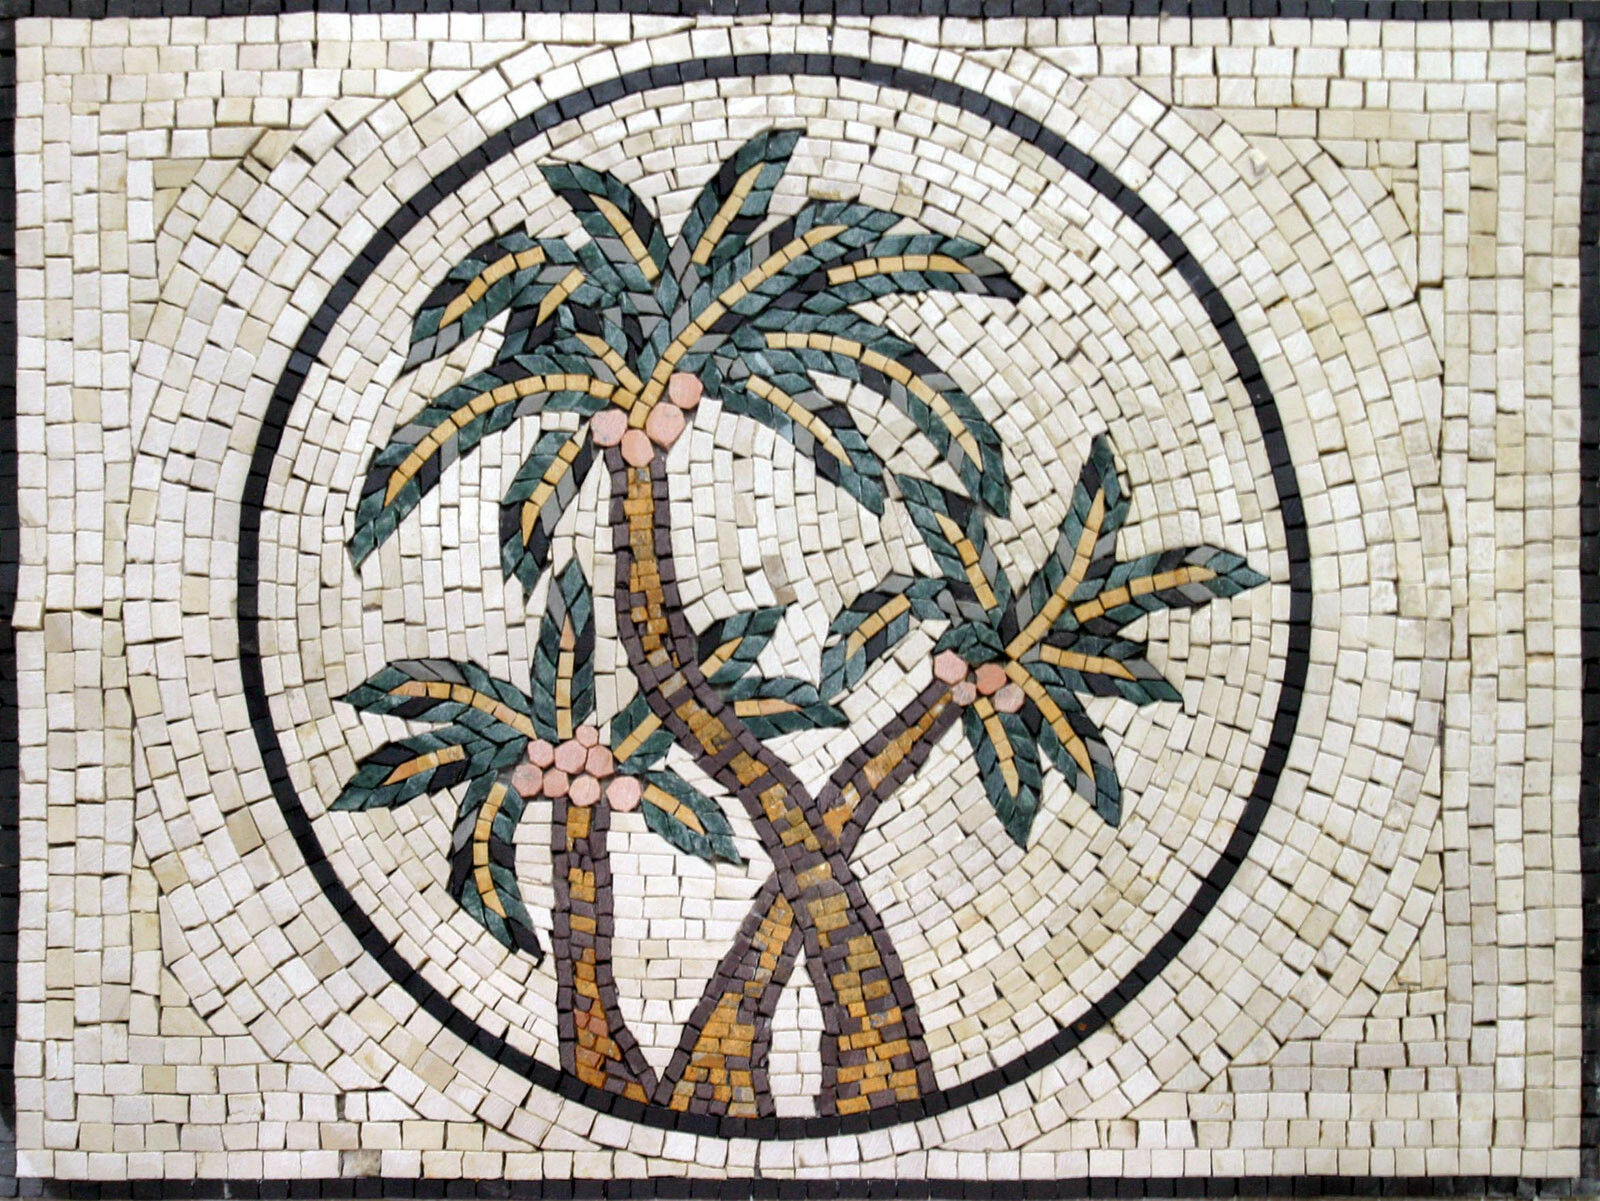 Palm Tree Yummy Dates Fruit Garden Design Home Marble Mosaic GEO1017